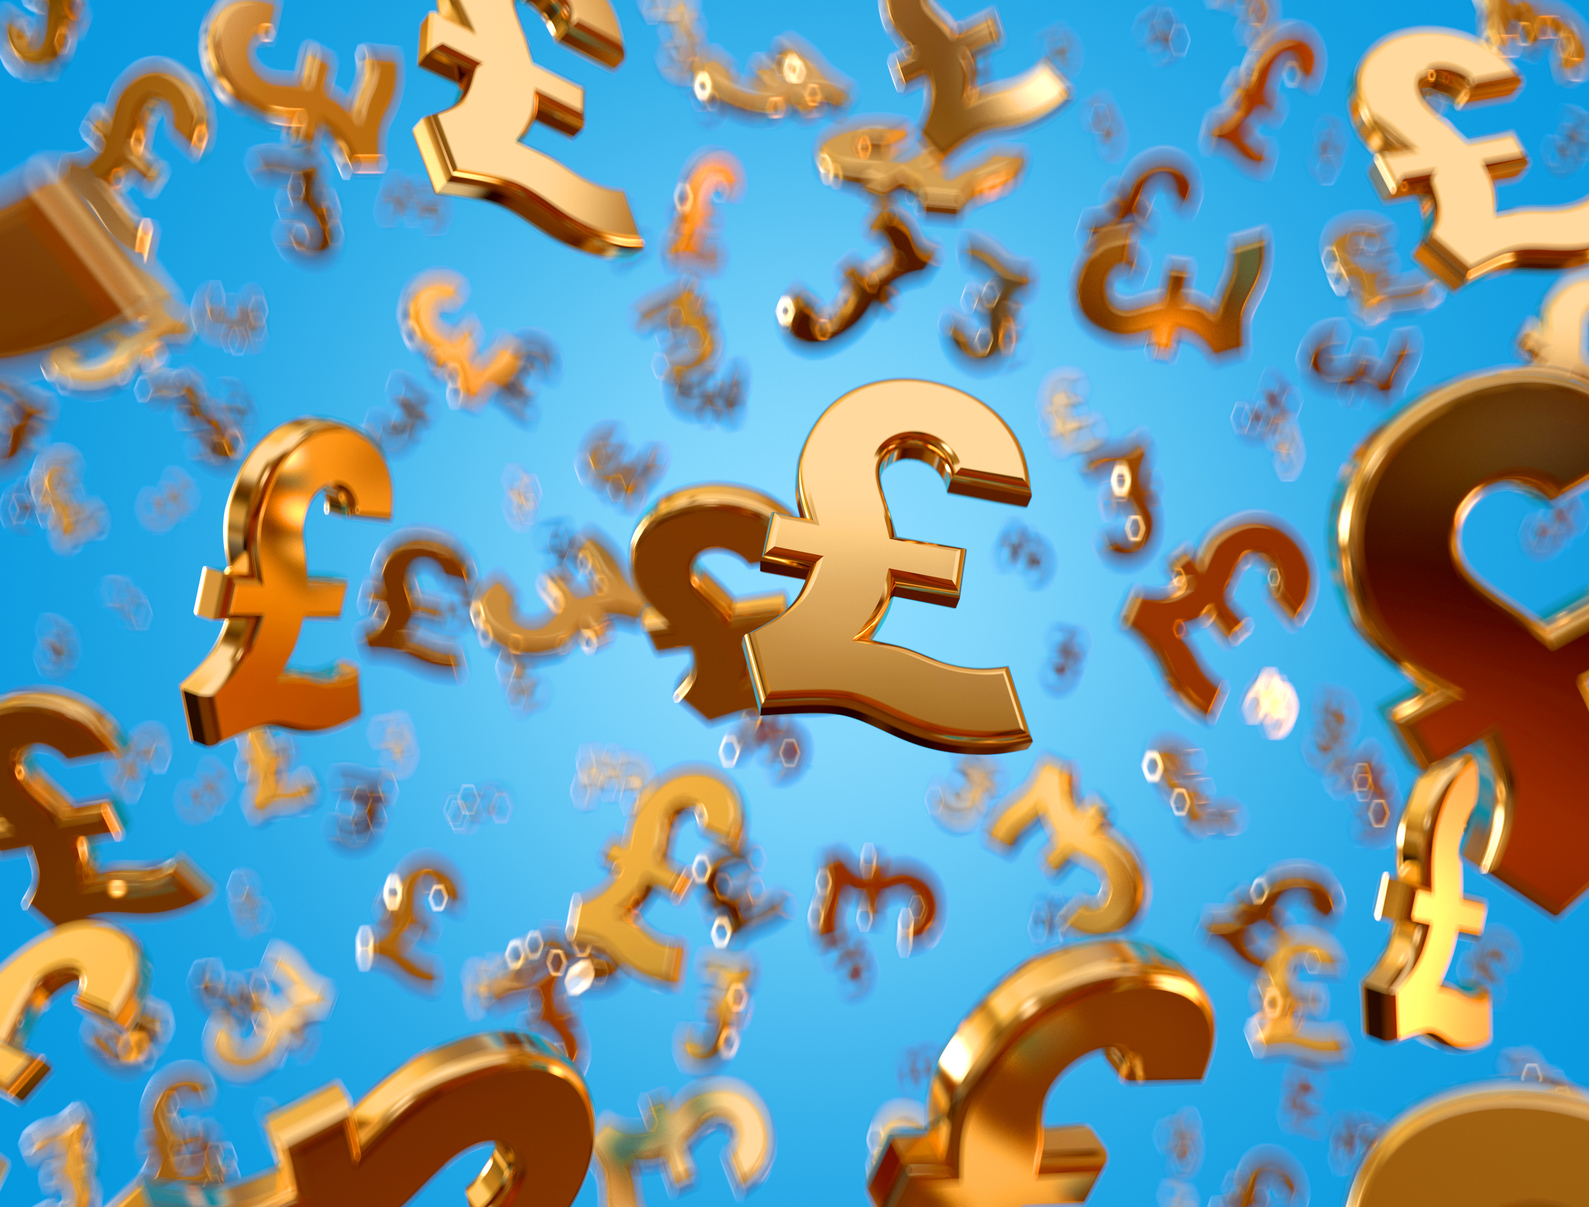 city bonuses money pound signs